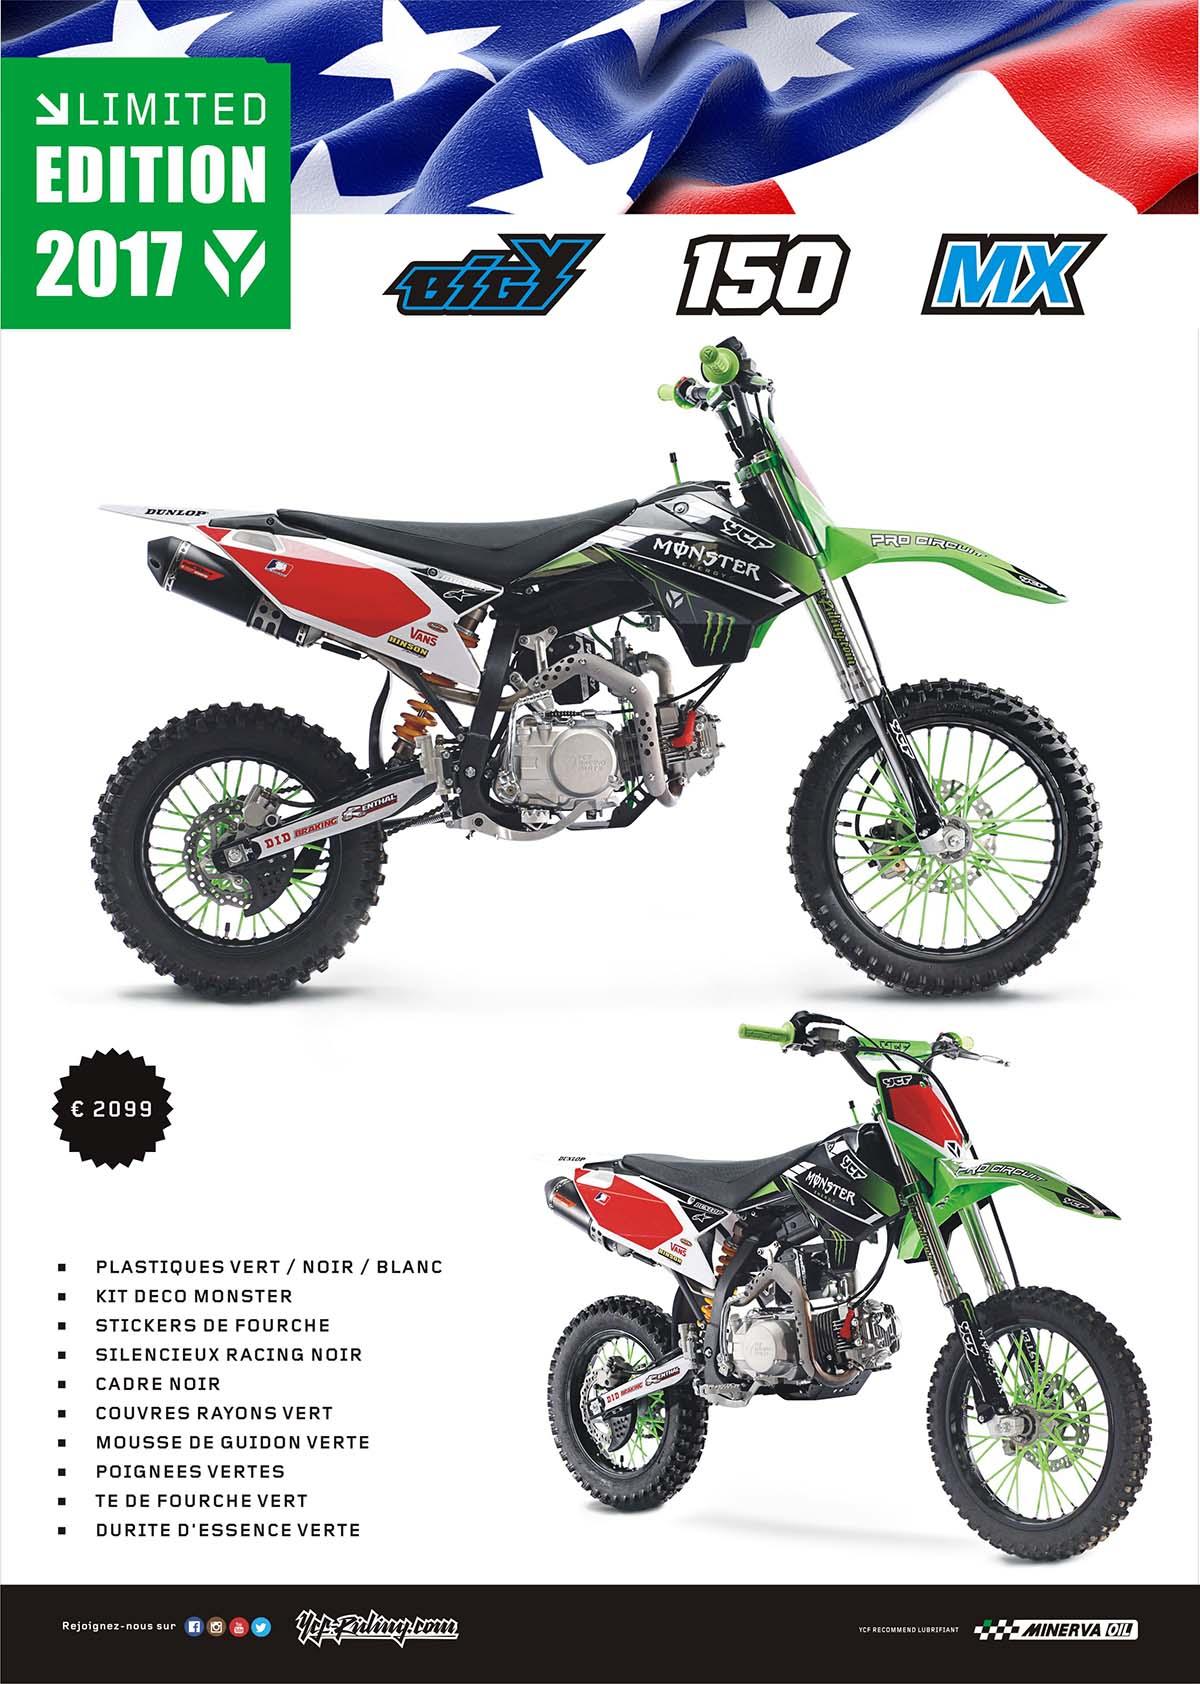 EQUIPEMENT YCF BIGY 150 MX MONSTER